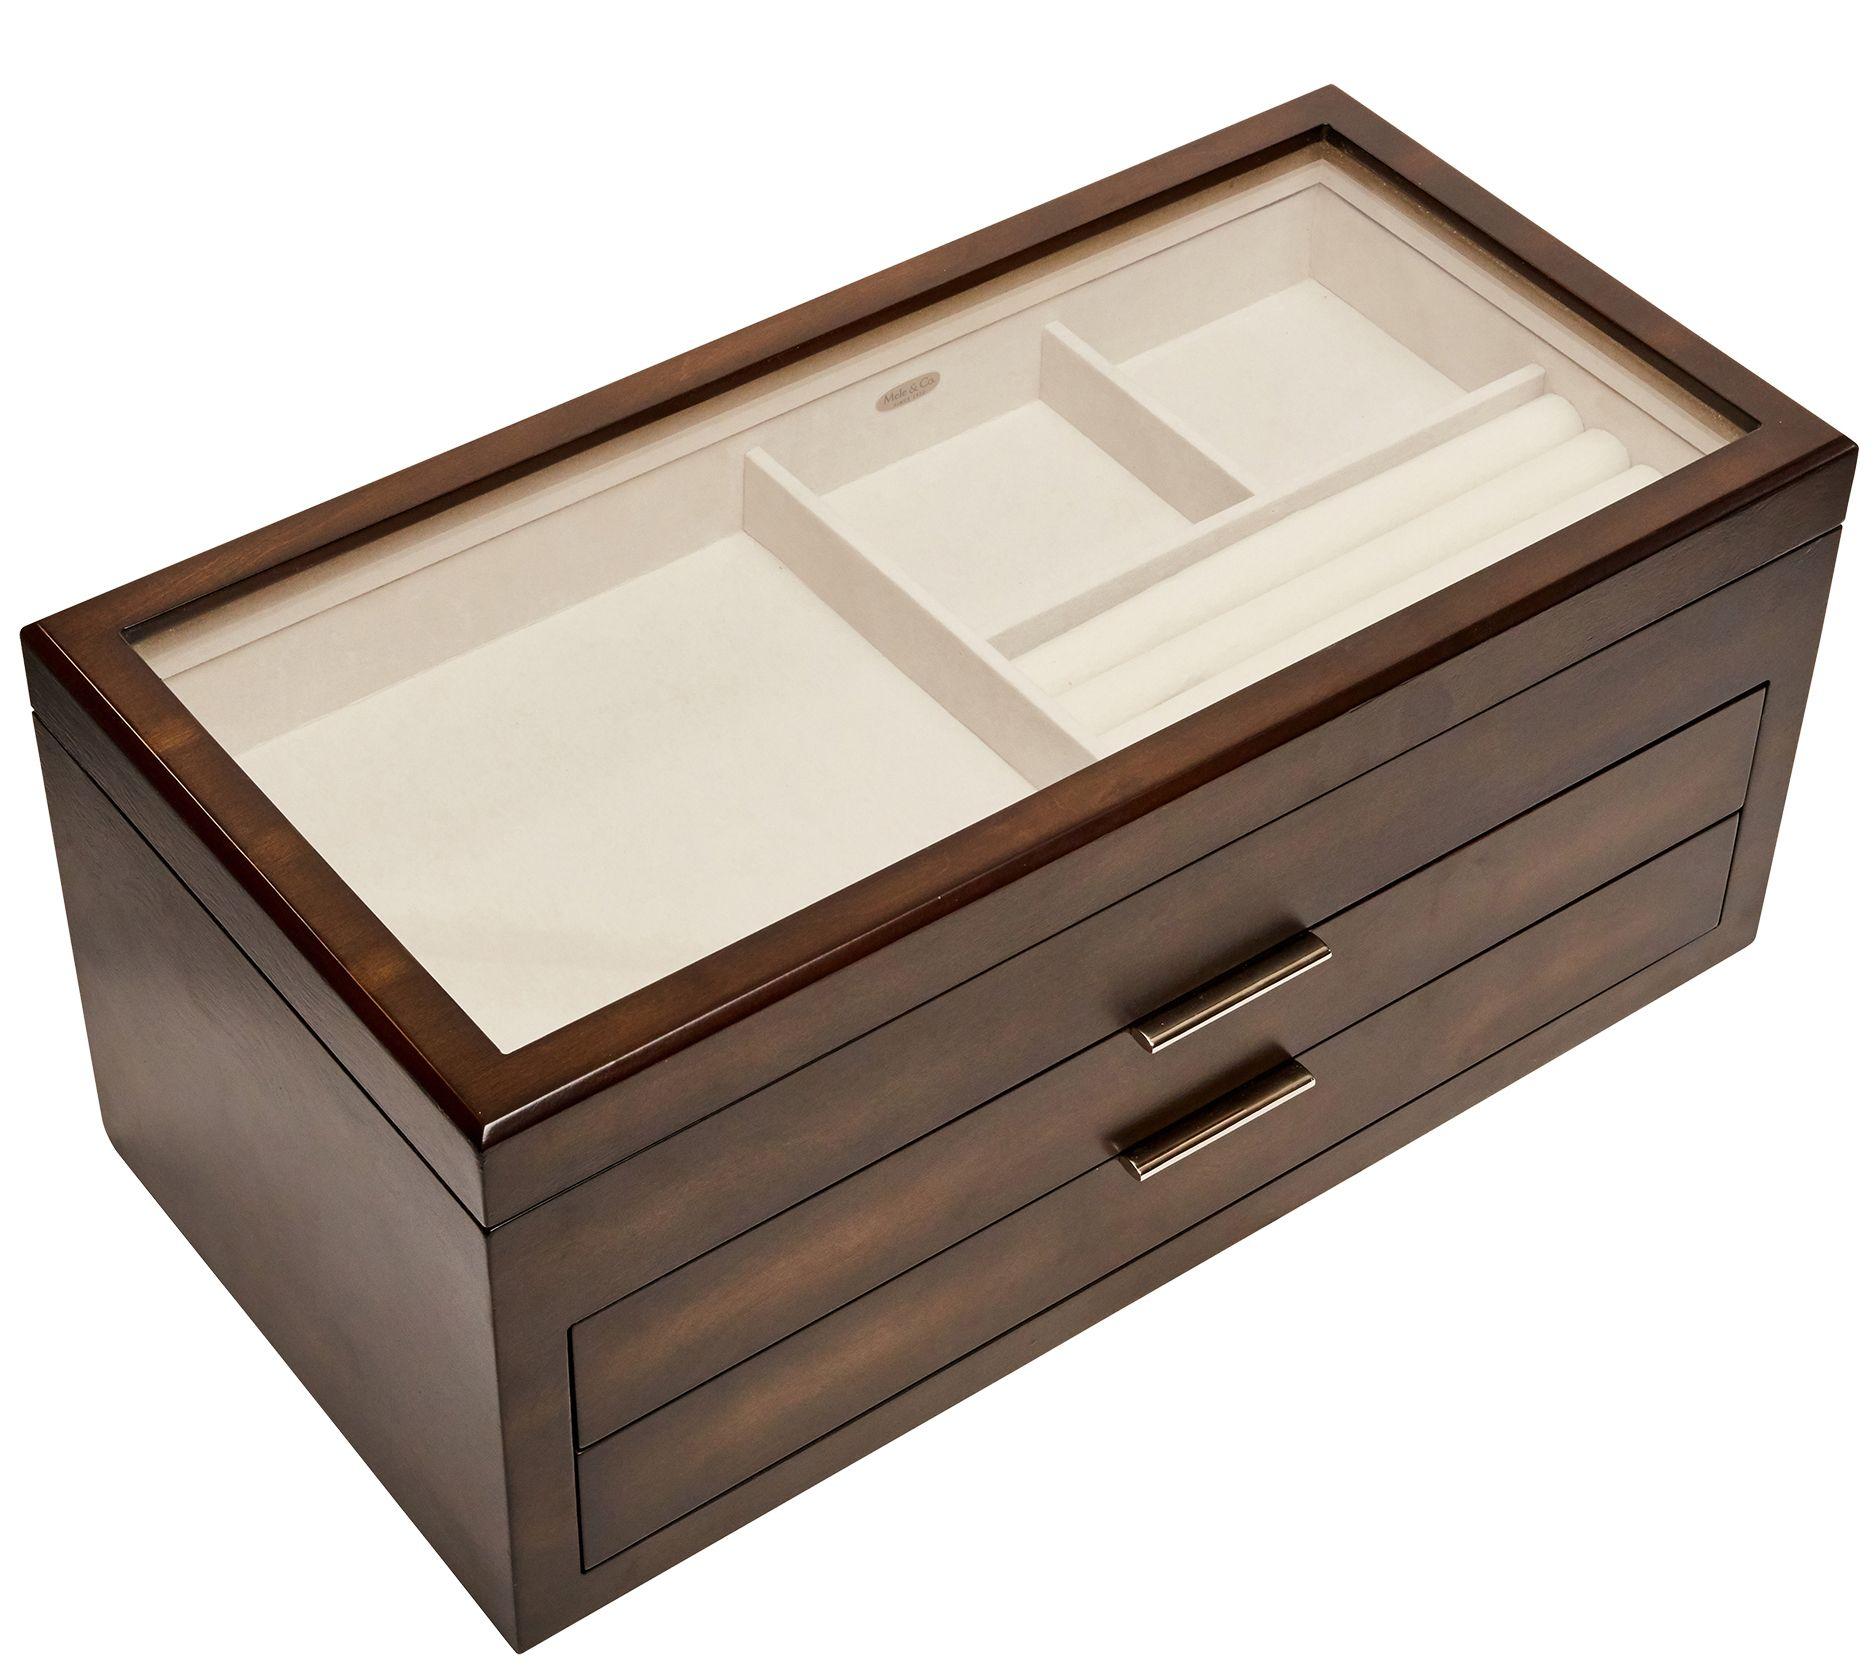 Mele Co Nova Glass Top Wooden Jewelry Box QVCcom